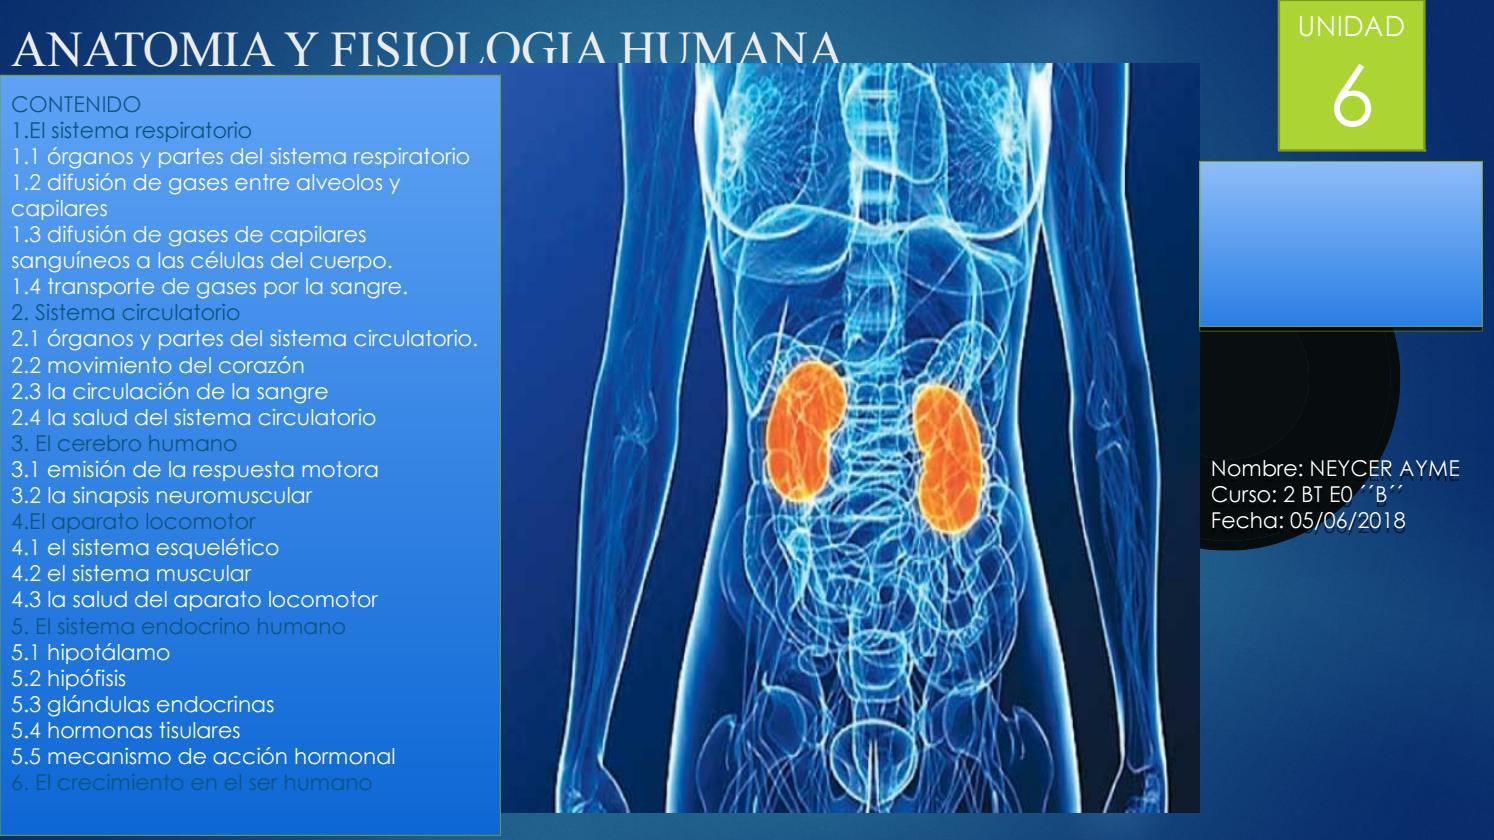 Anatomia y fisiologia humana by neycerayme2017 - issuu